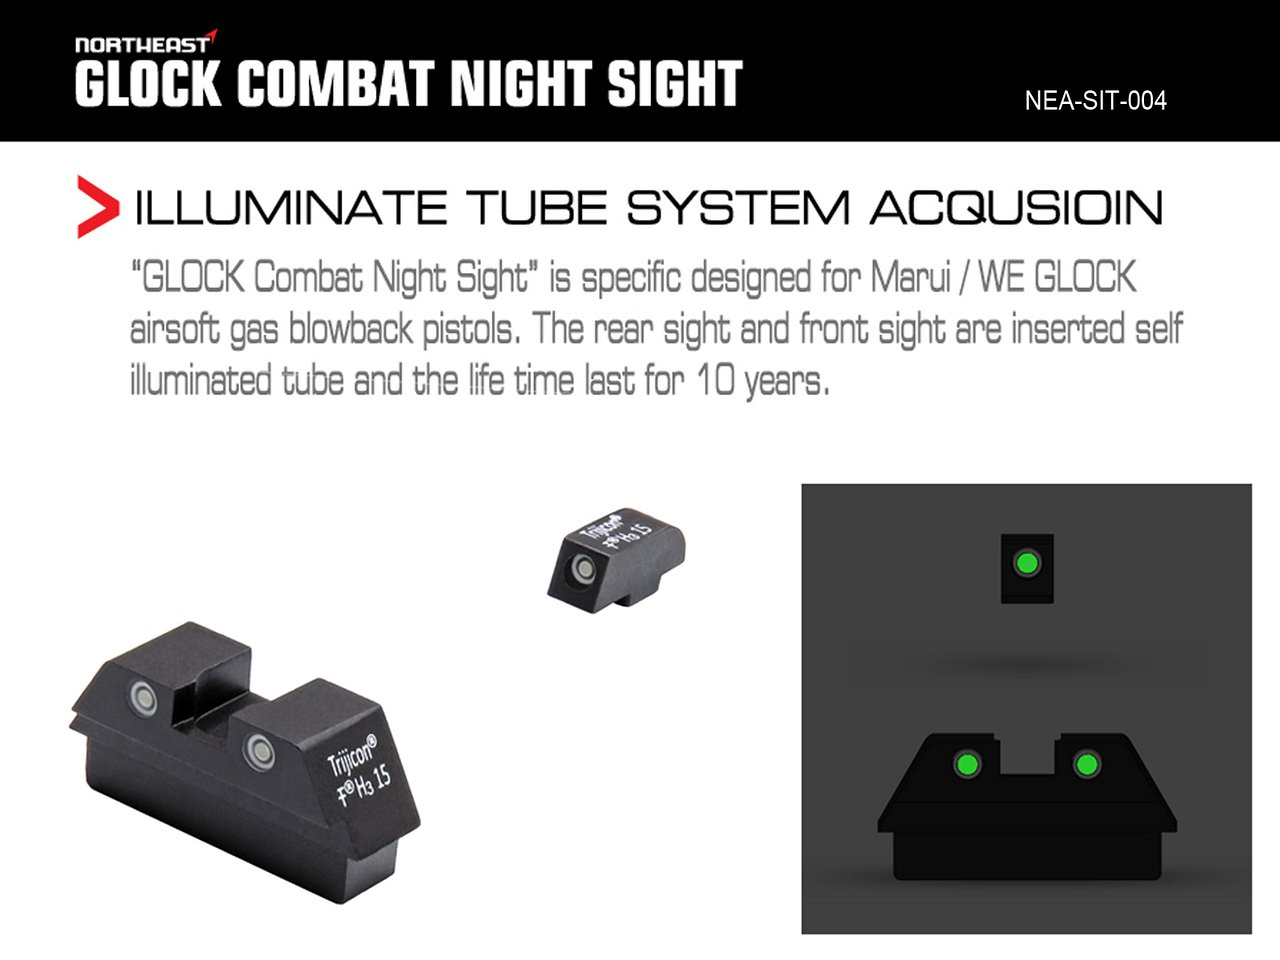 NorthEast Glock Combat NightSights/トリチウムナイトサイト (マルイ/WE Glock用)